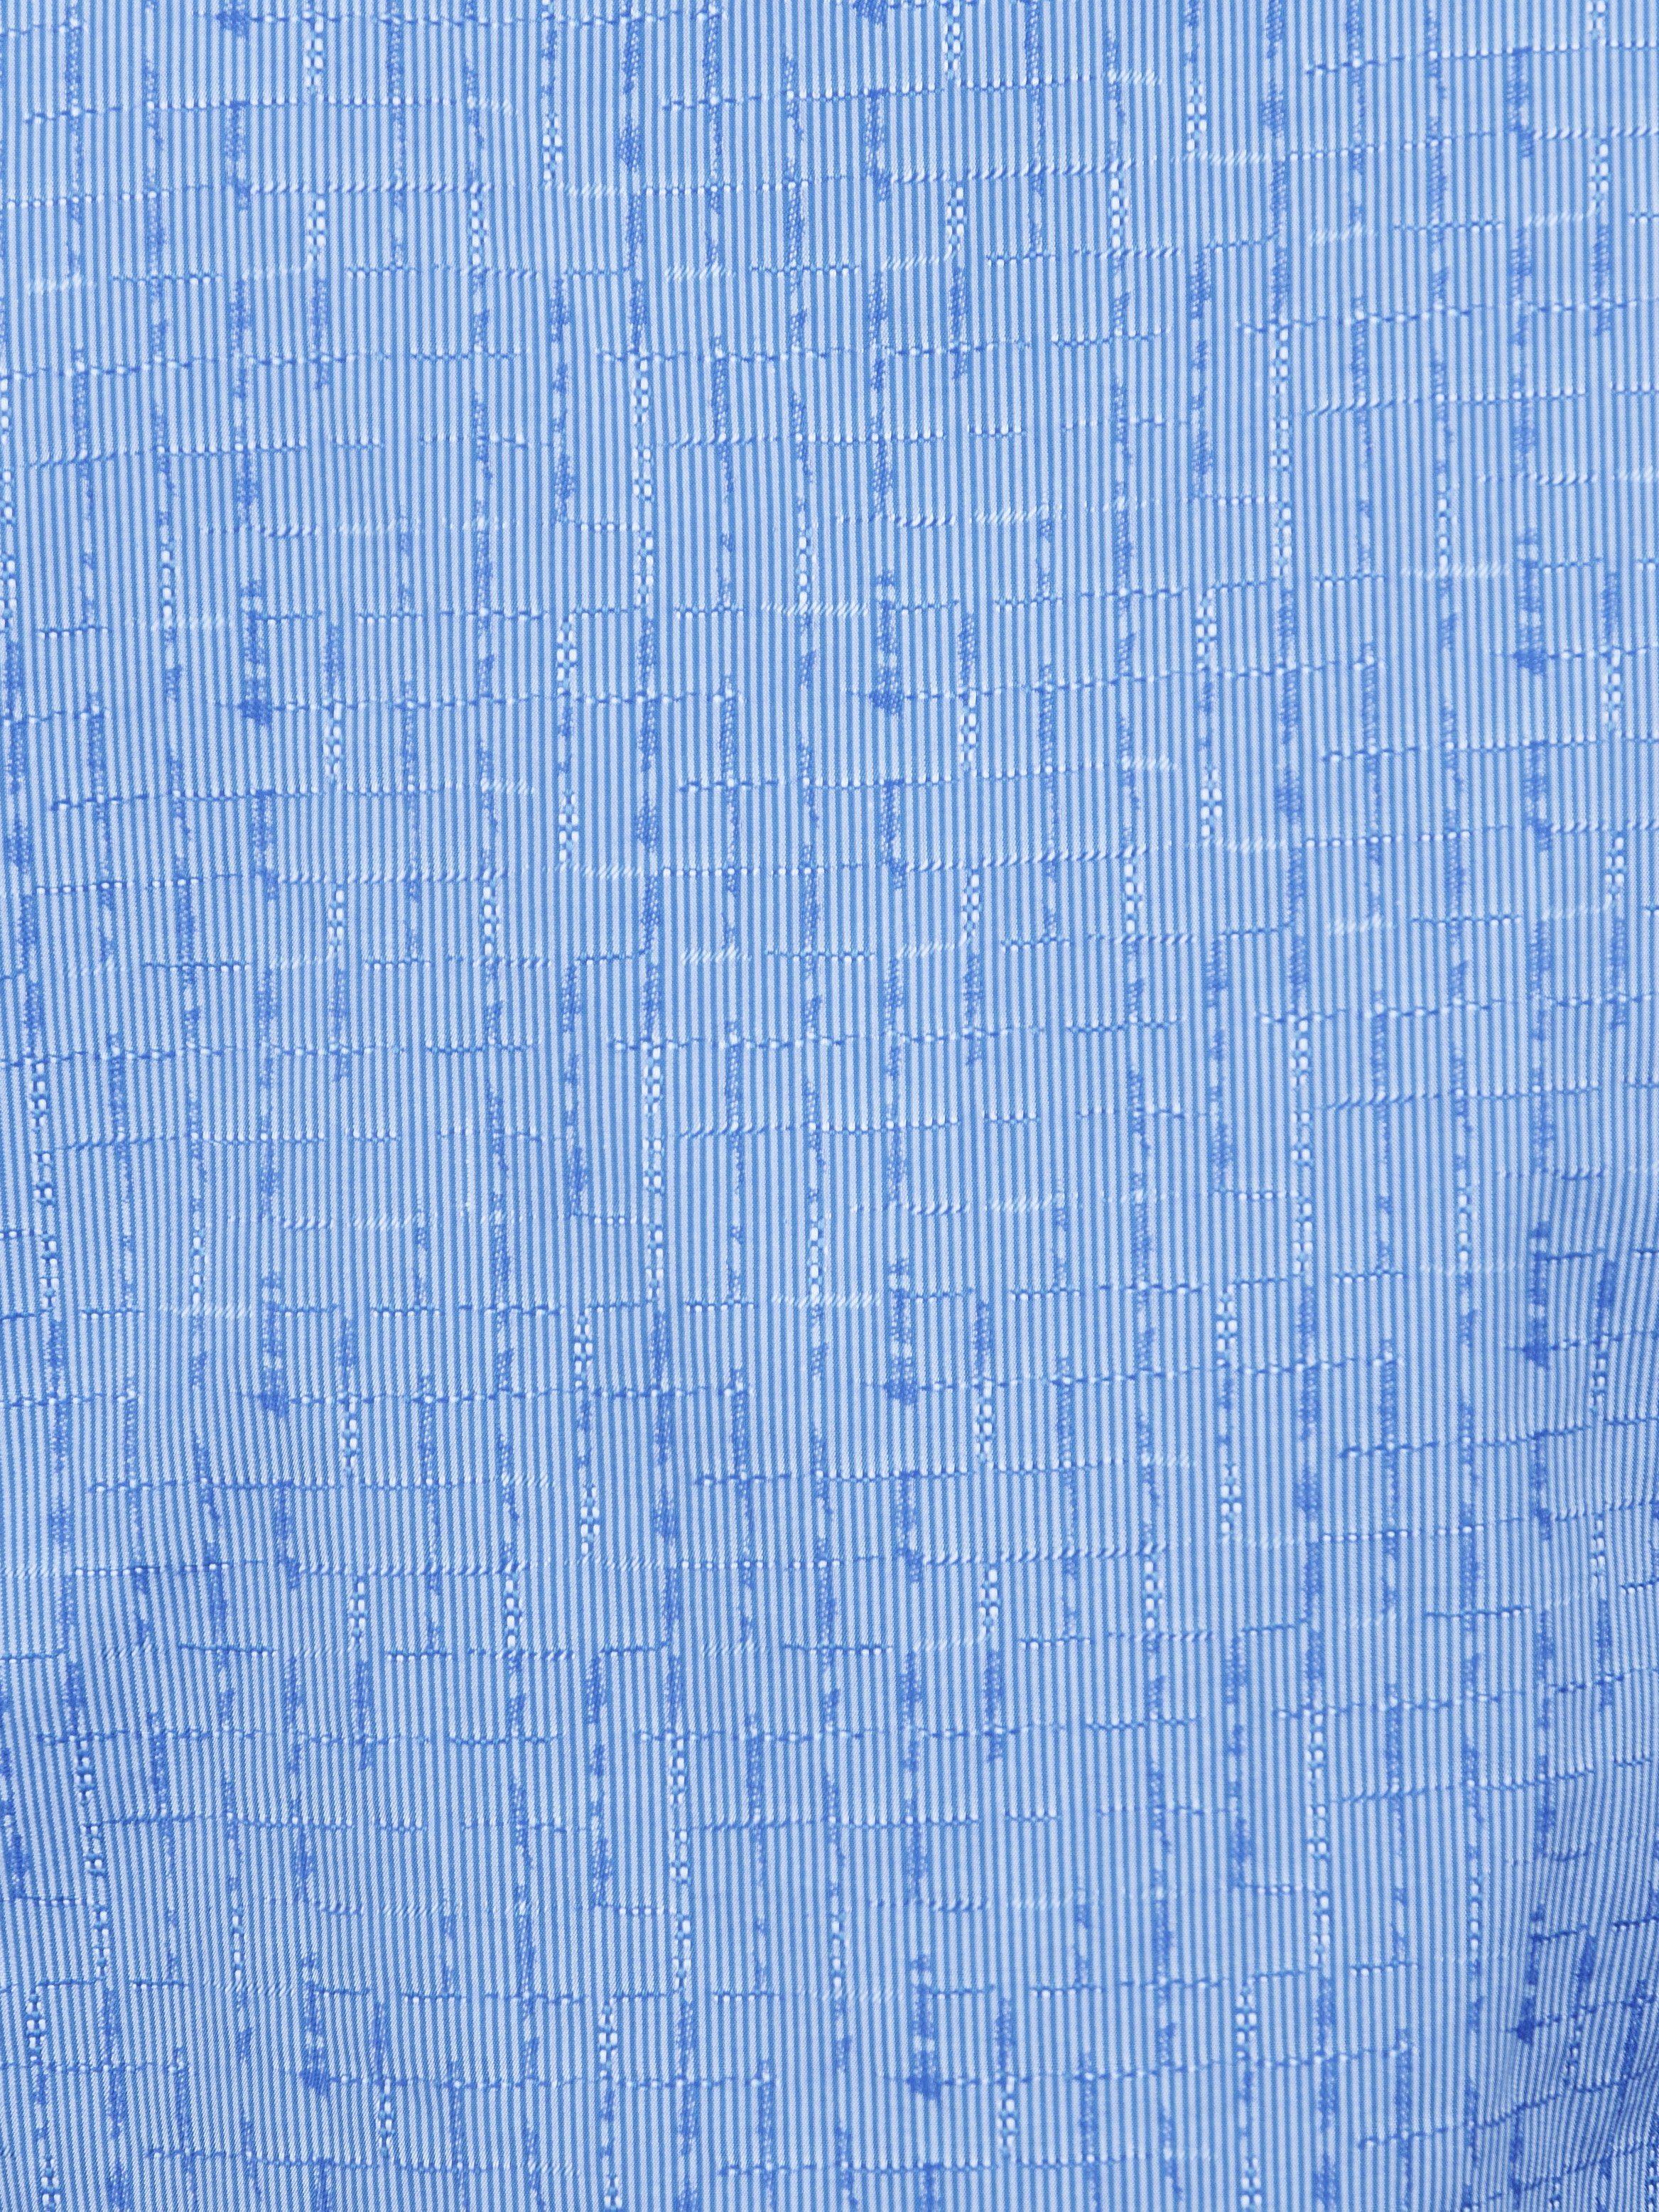 Galileo Broken Line  Blue